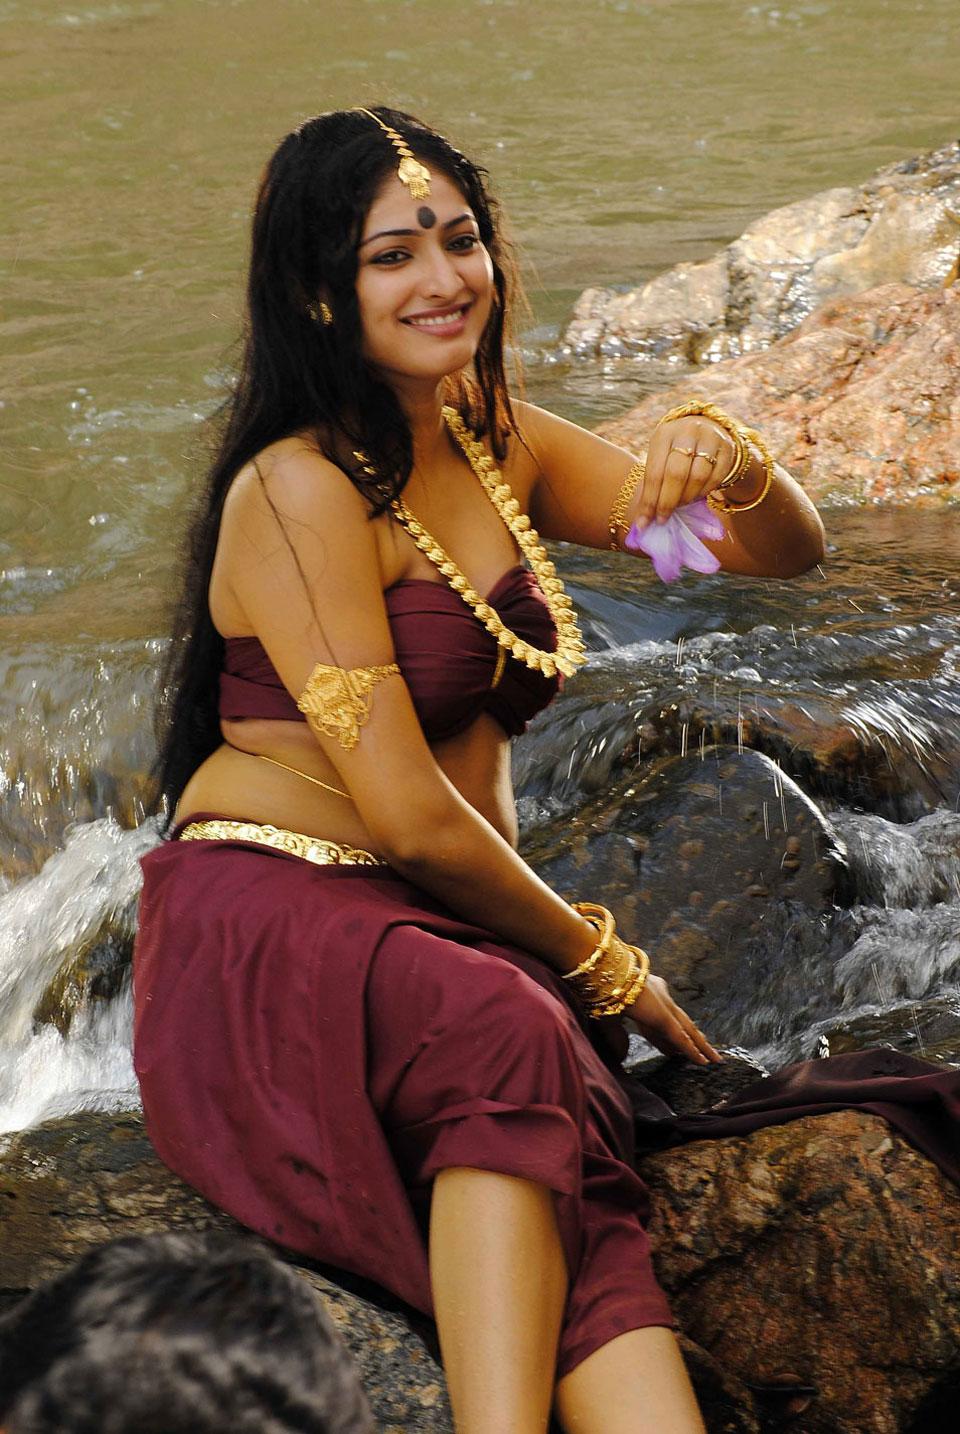 Hari priya hot in wet dress photos